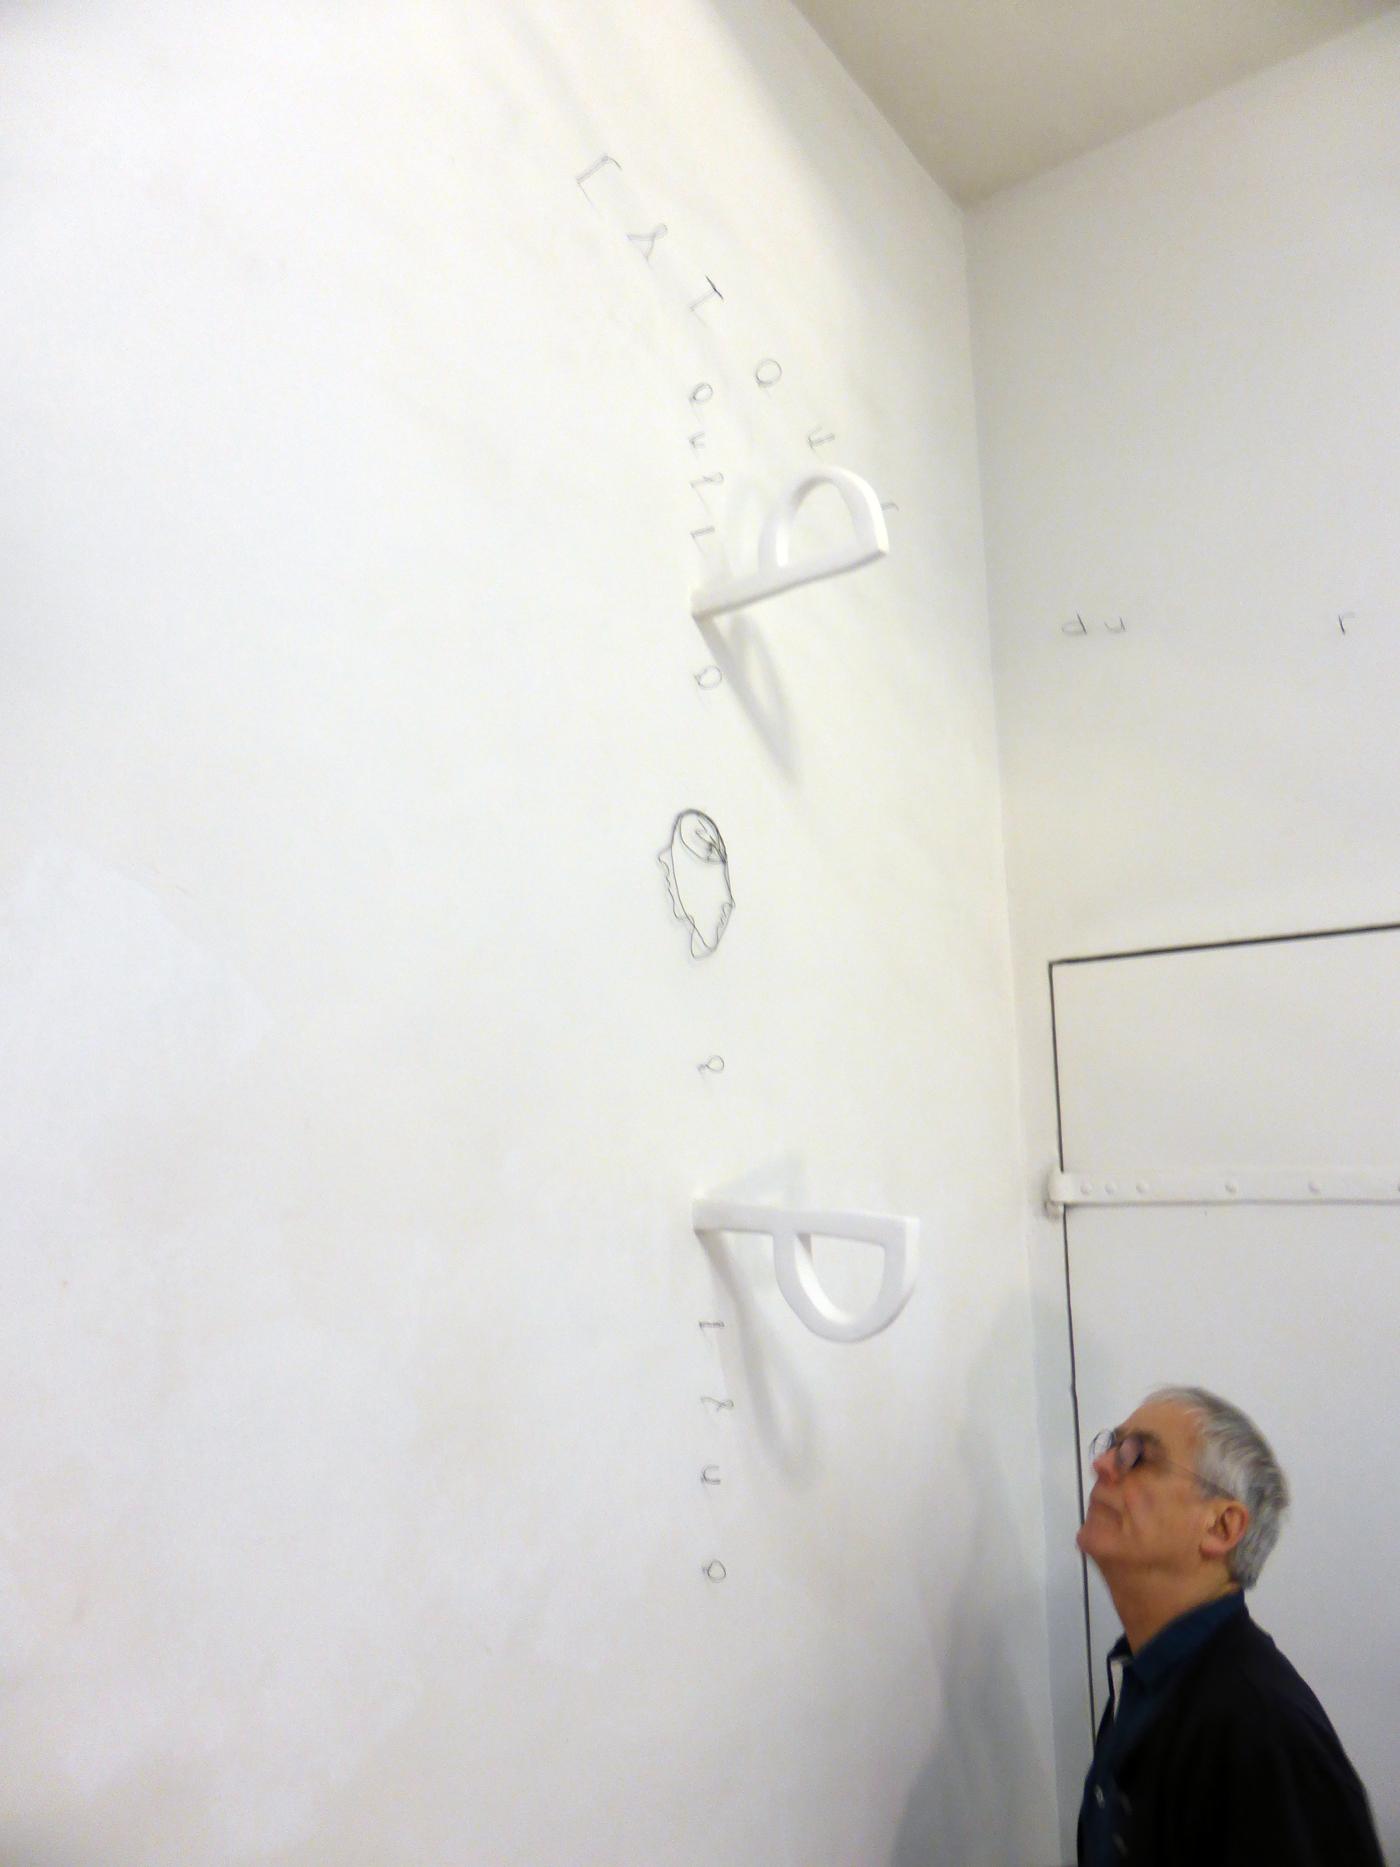 bn escalier6 +jj